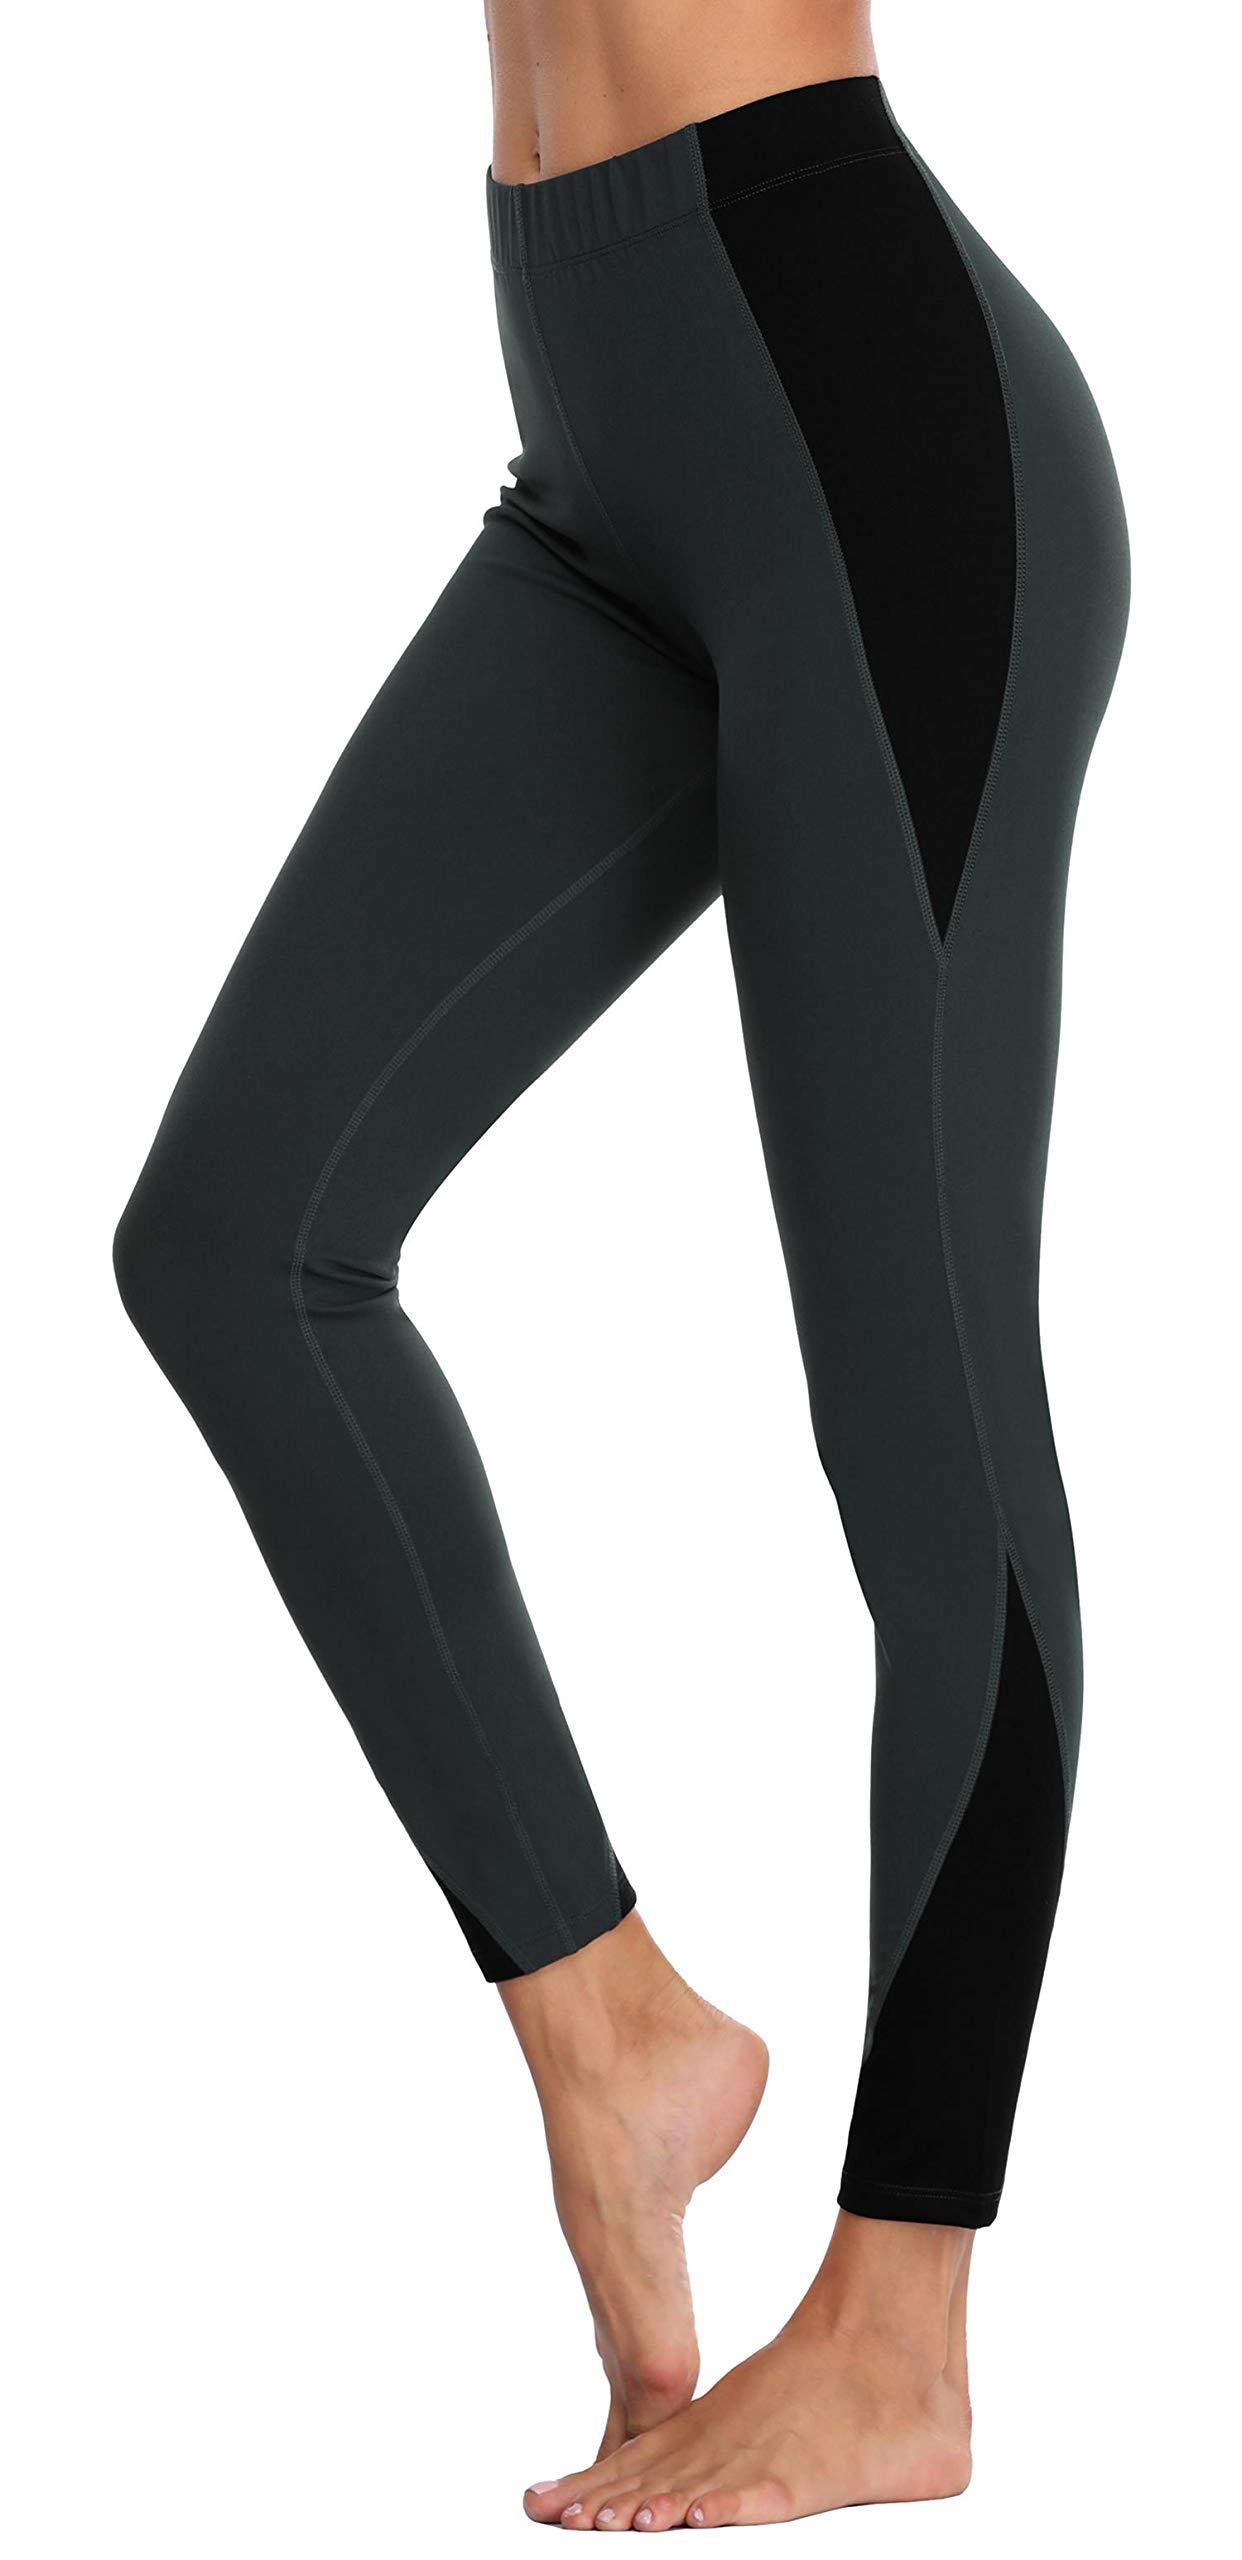 ATTRACO Womens High Waist Pockets Yoga Pants Running Pants Workout Leggings